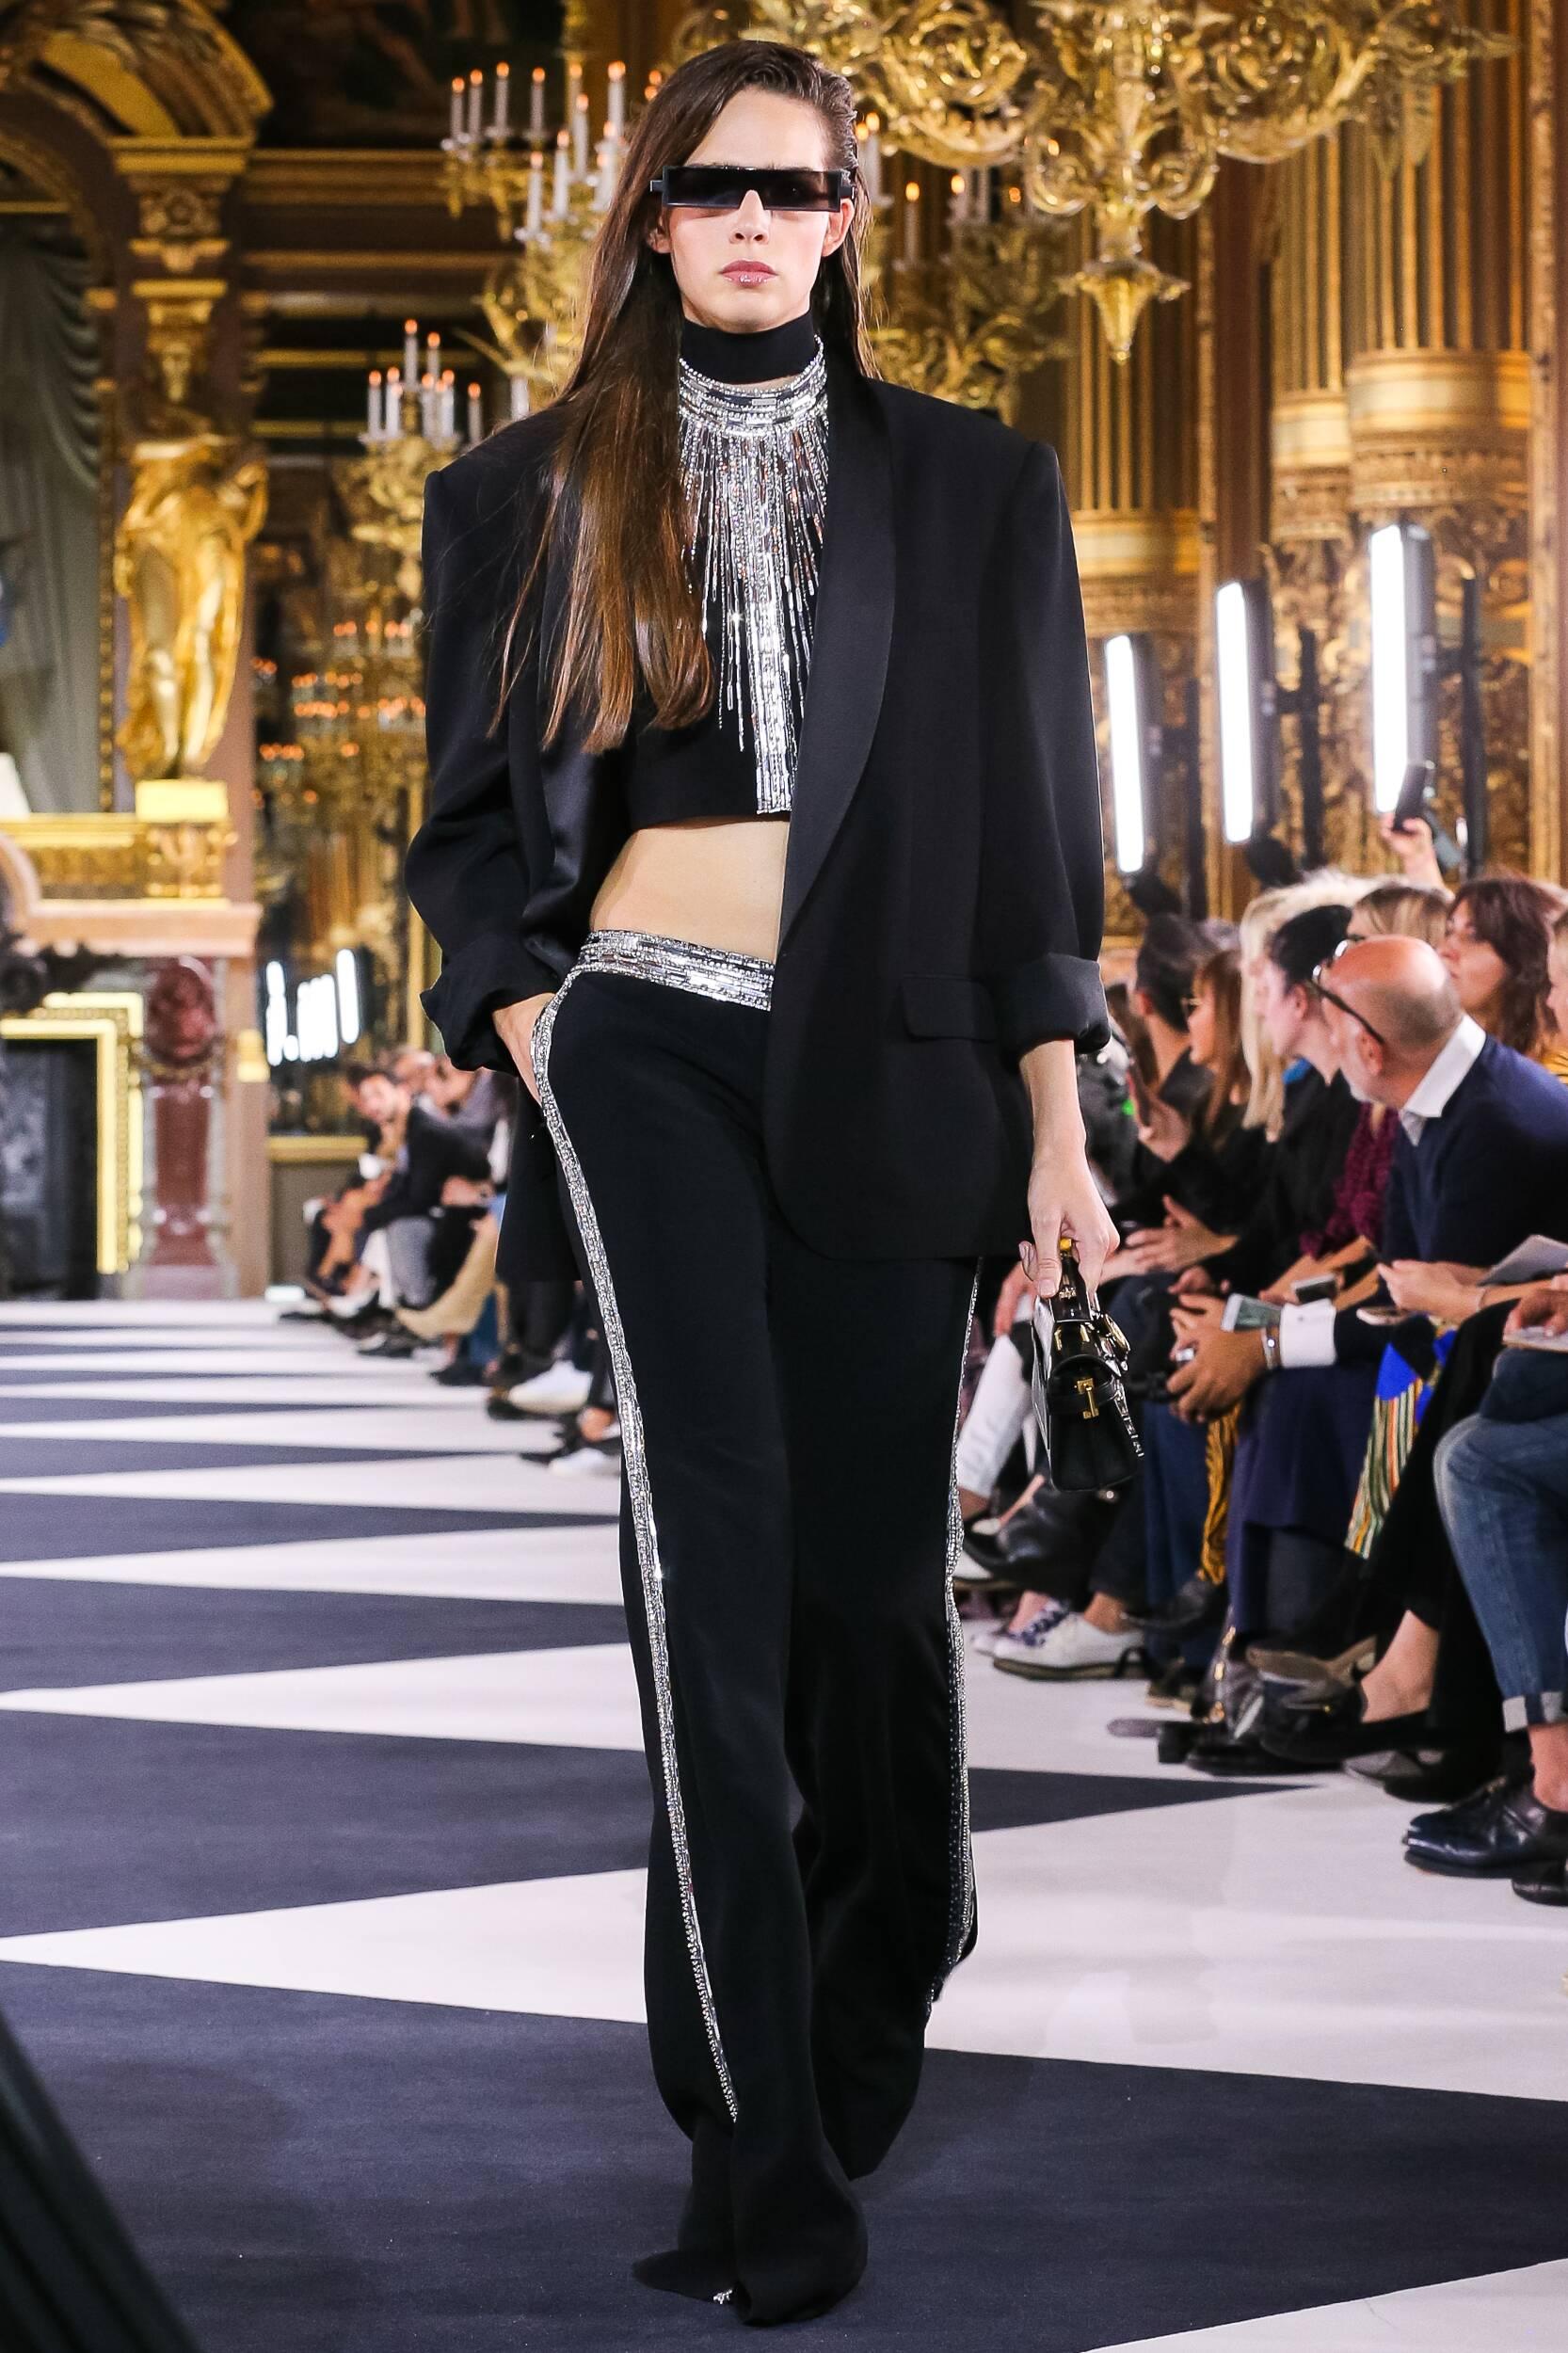 SS 2020 Balmain Show Paris Fashion Womenswear